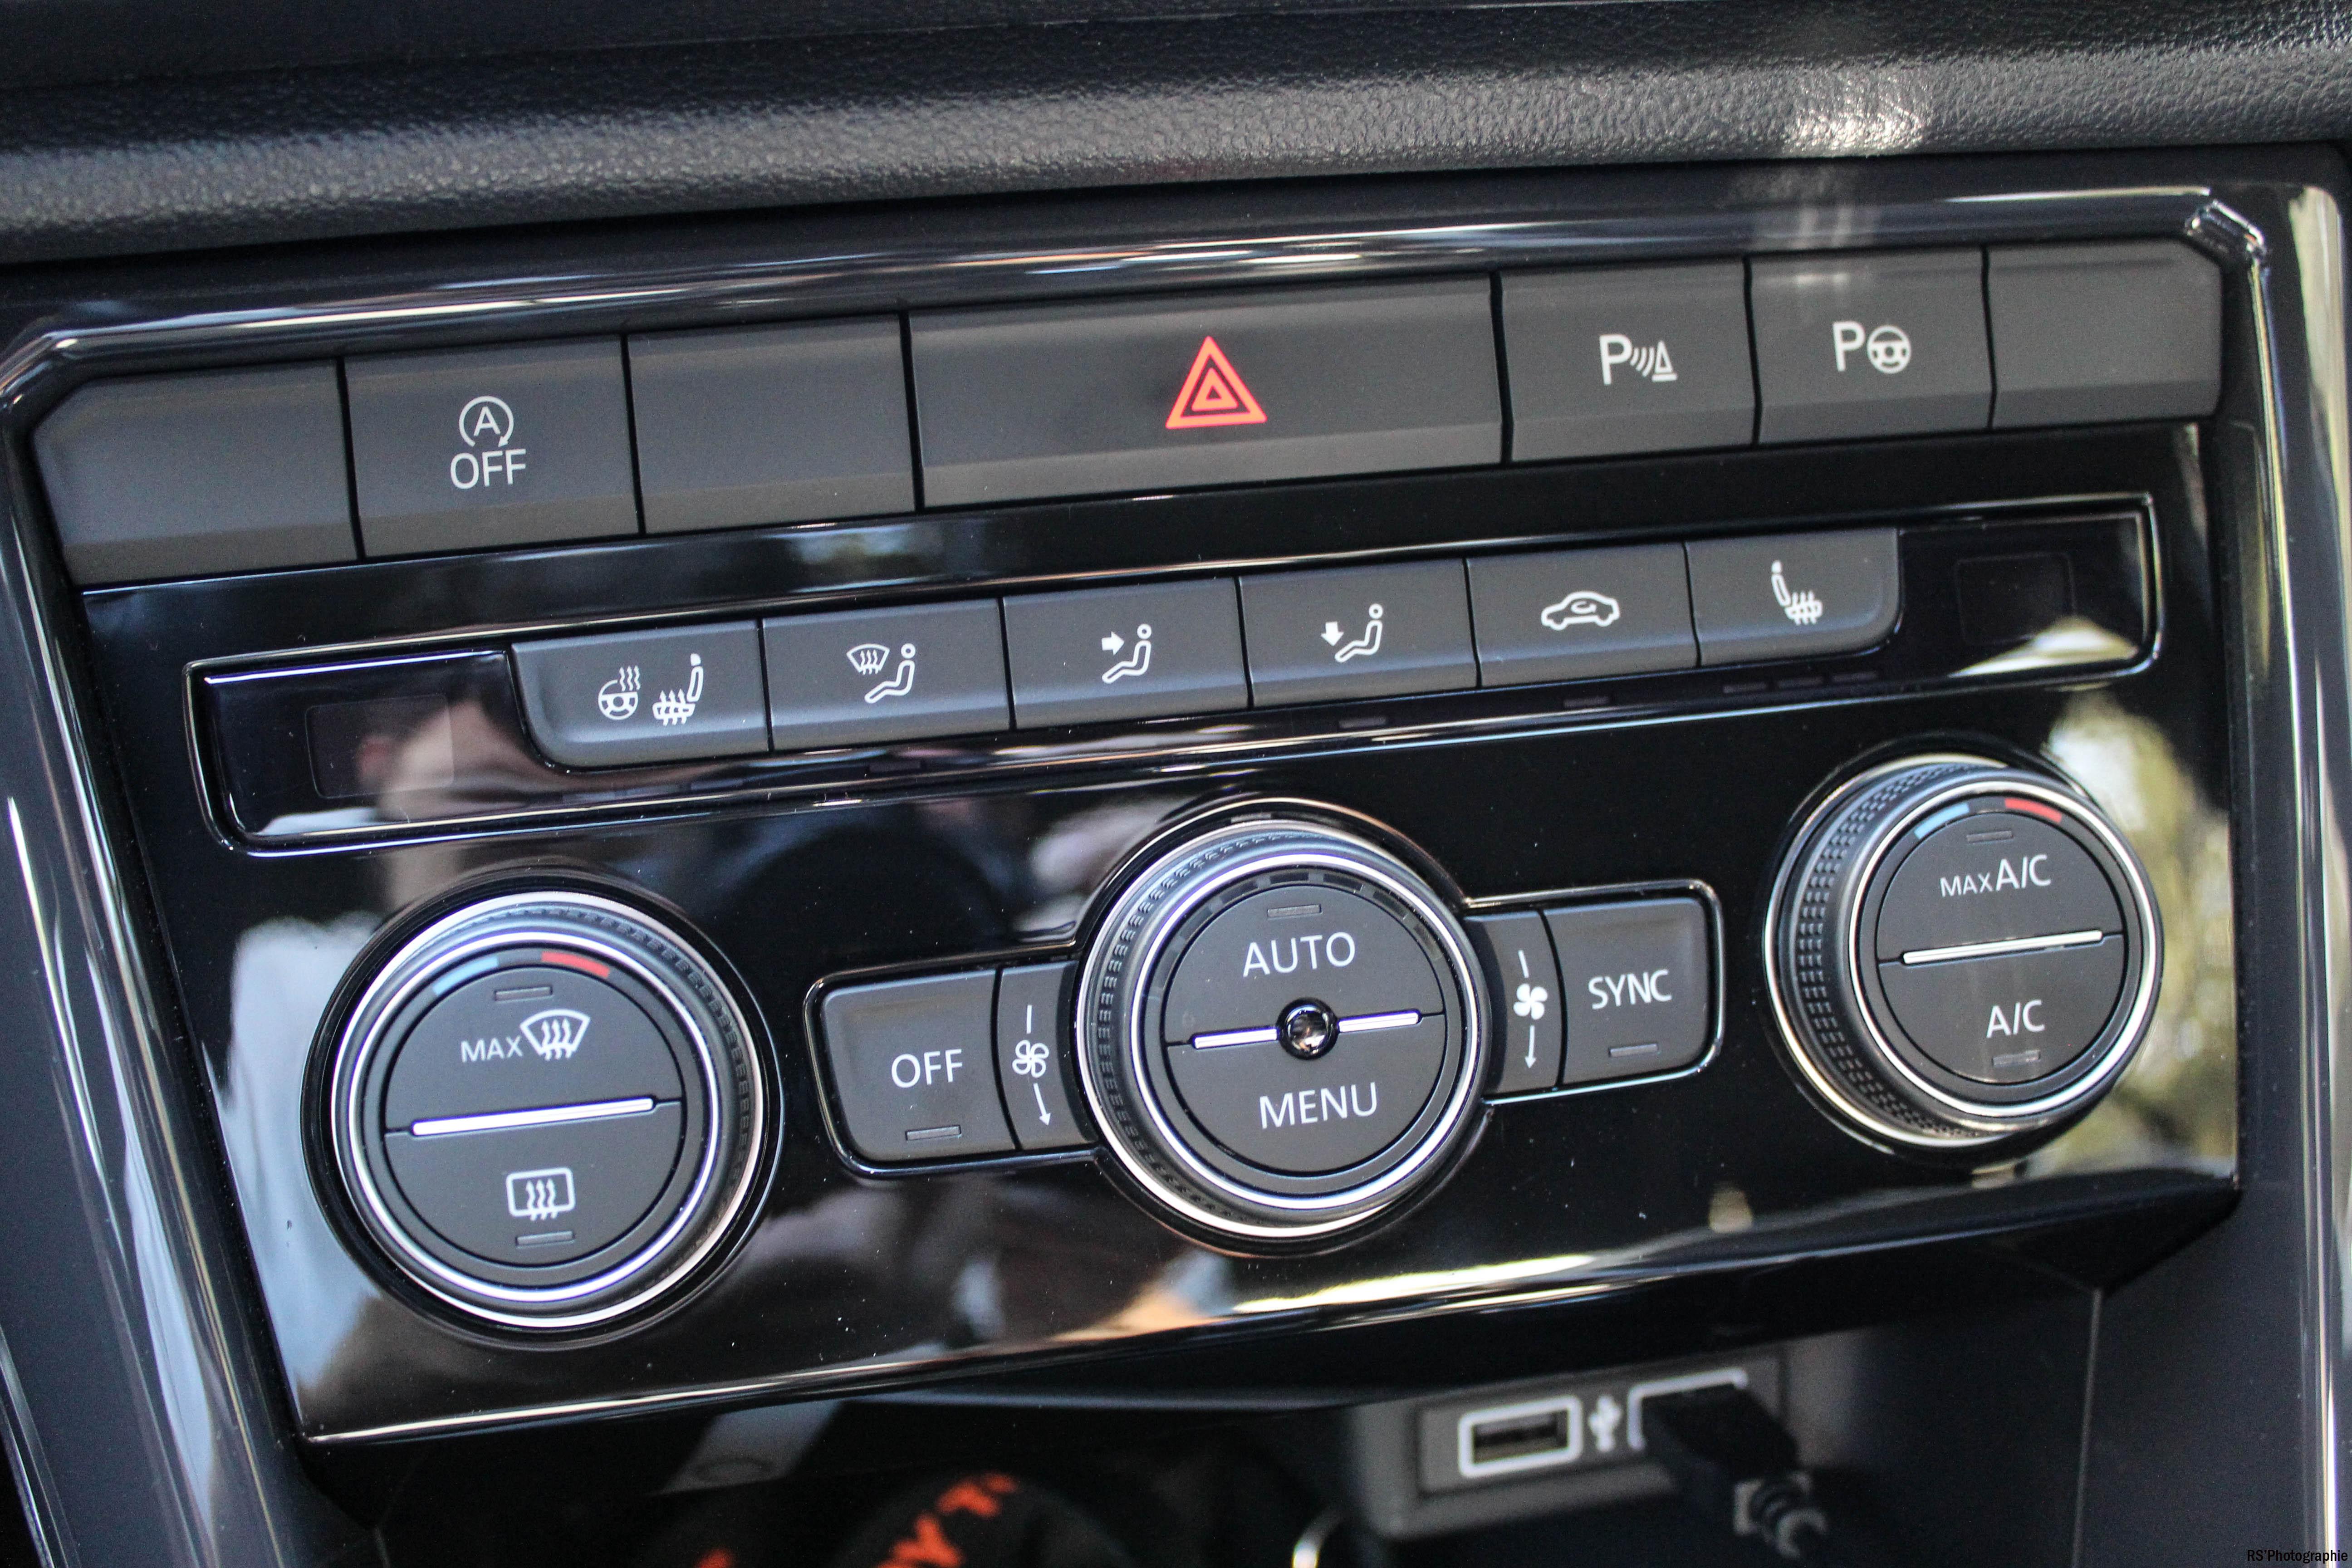 Volkswagentroc12-vw-t-roc-intérieur-onboard-Arnaud Demasier-RSPhotographie